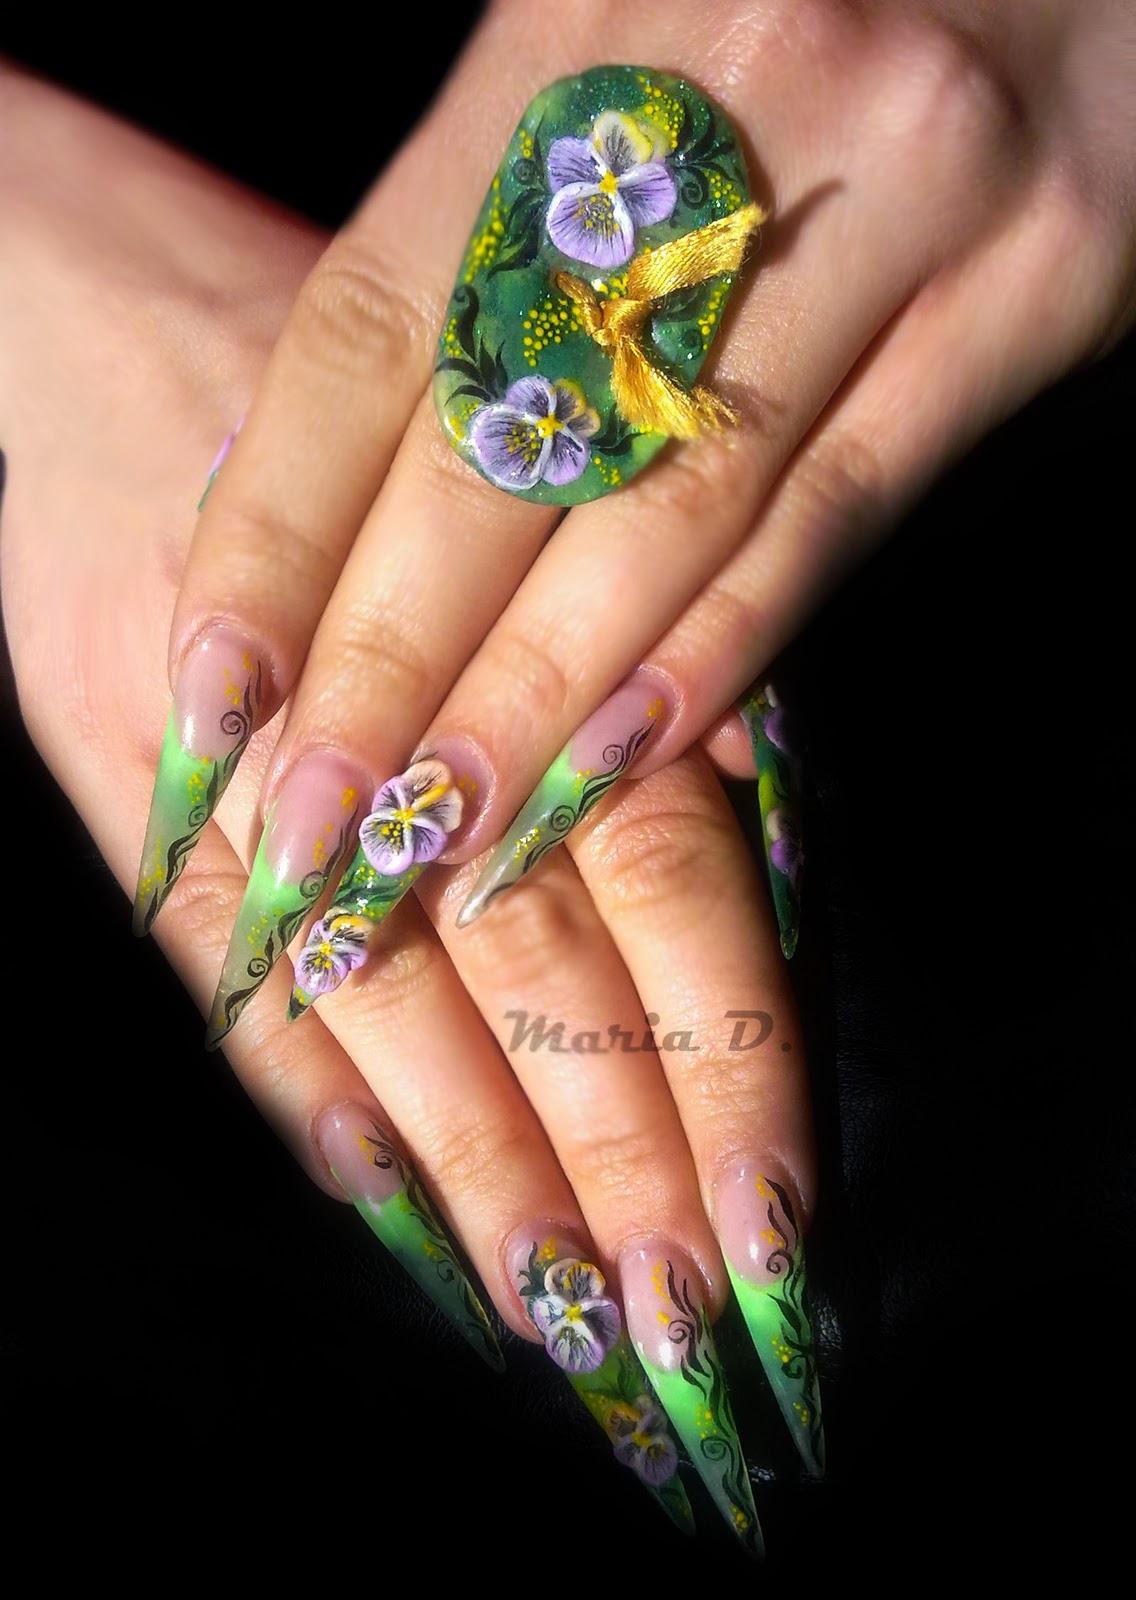 Nail Designs For Stiletto Nails | Nail Designs, Hair Styles, Tattoos ...